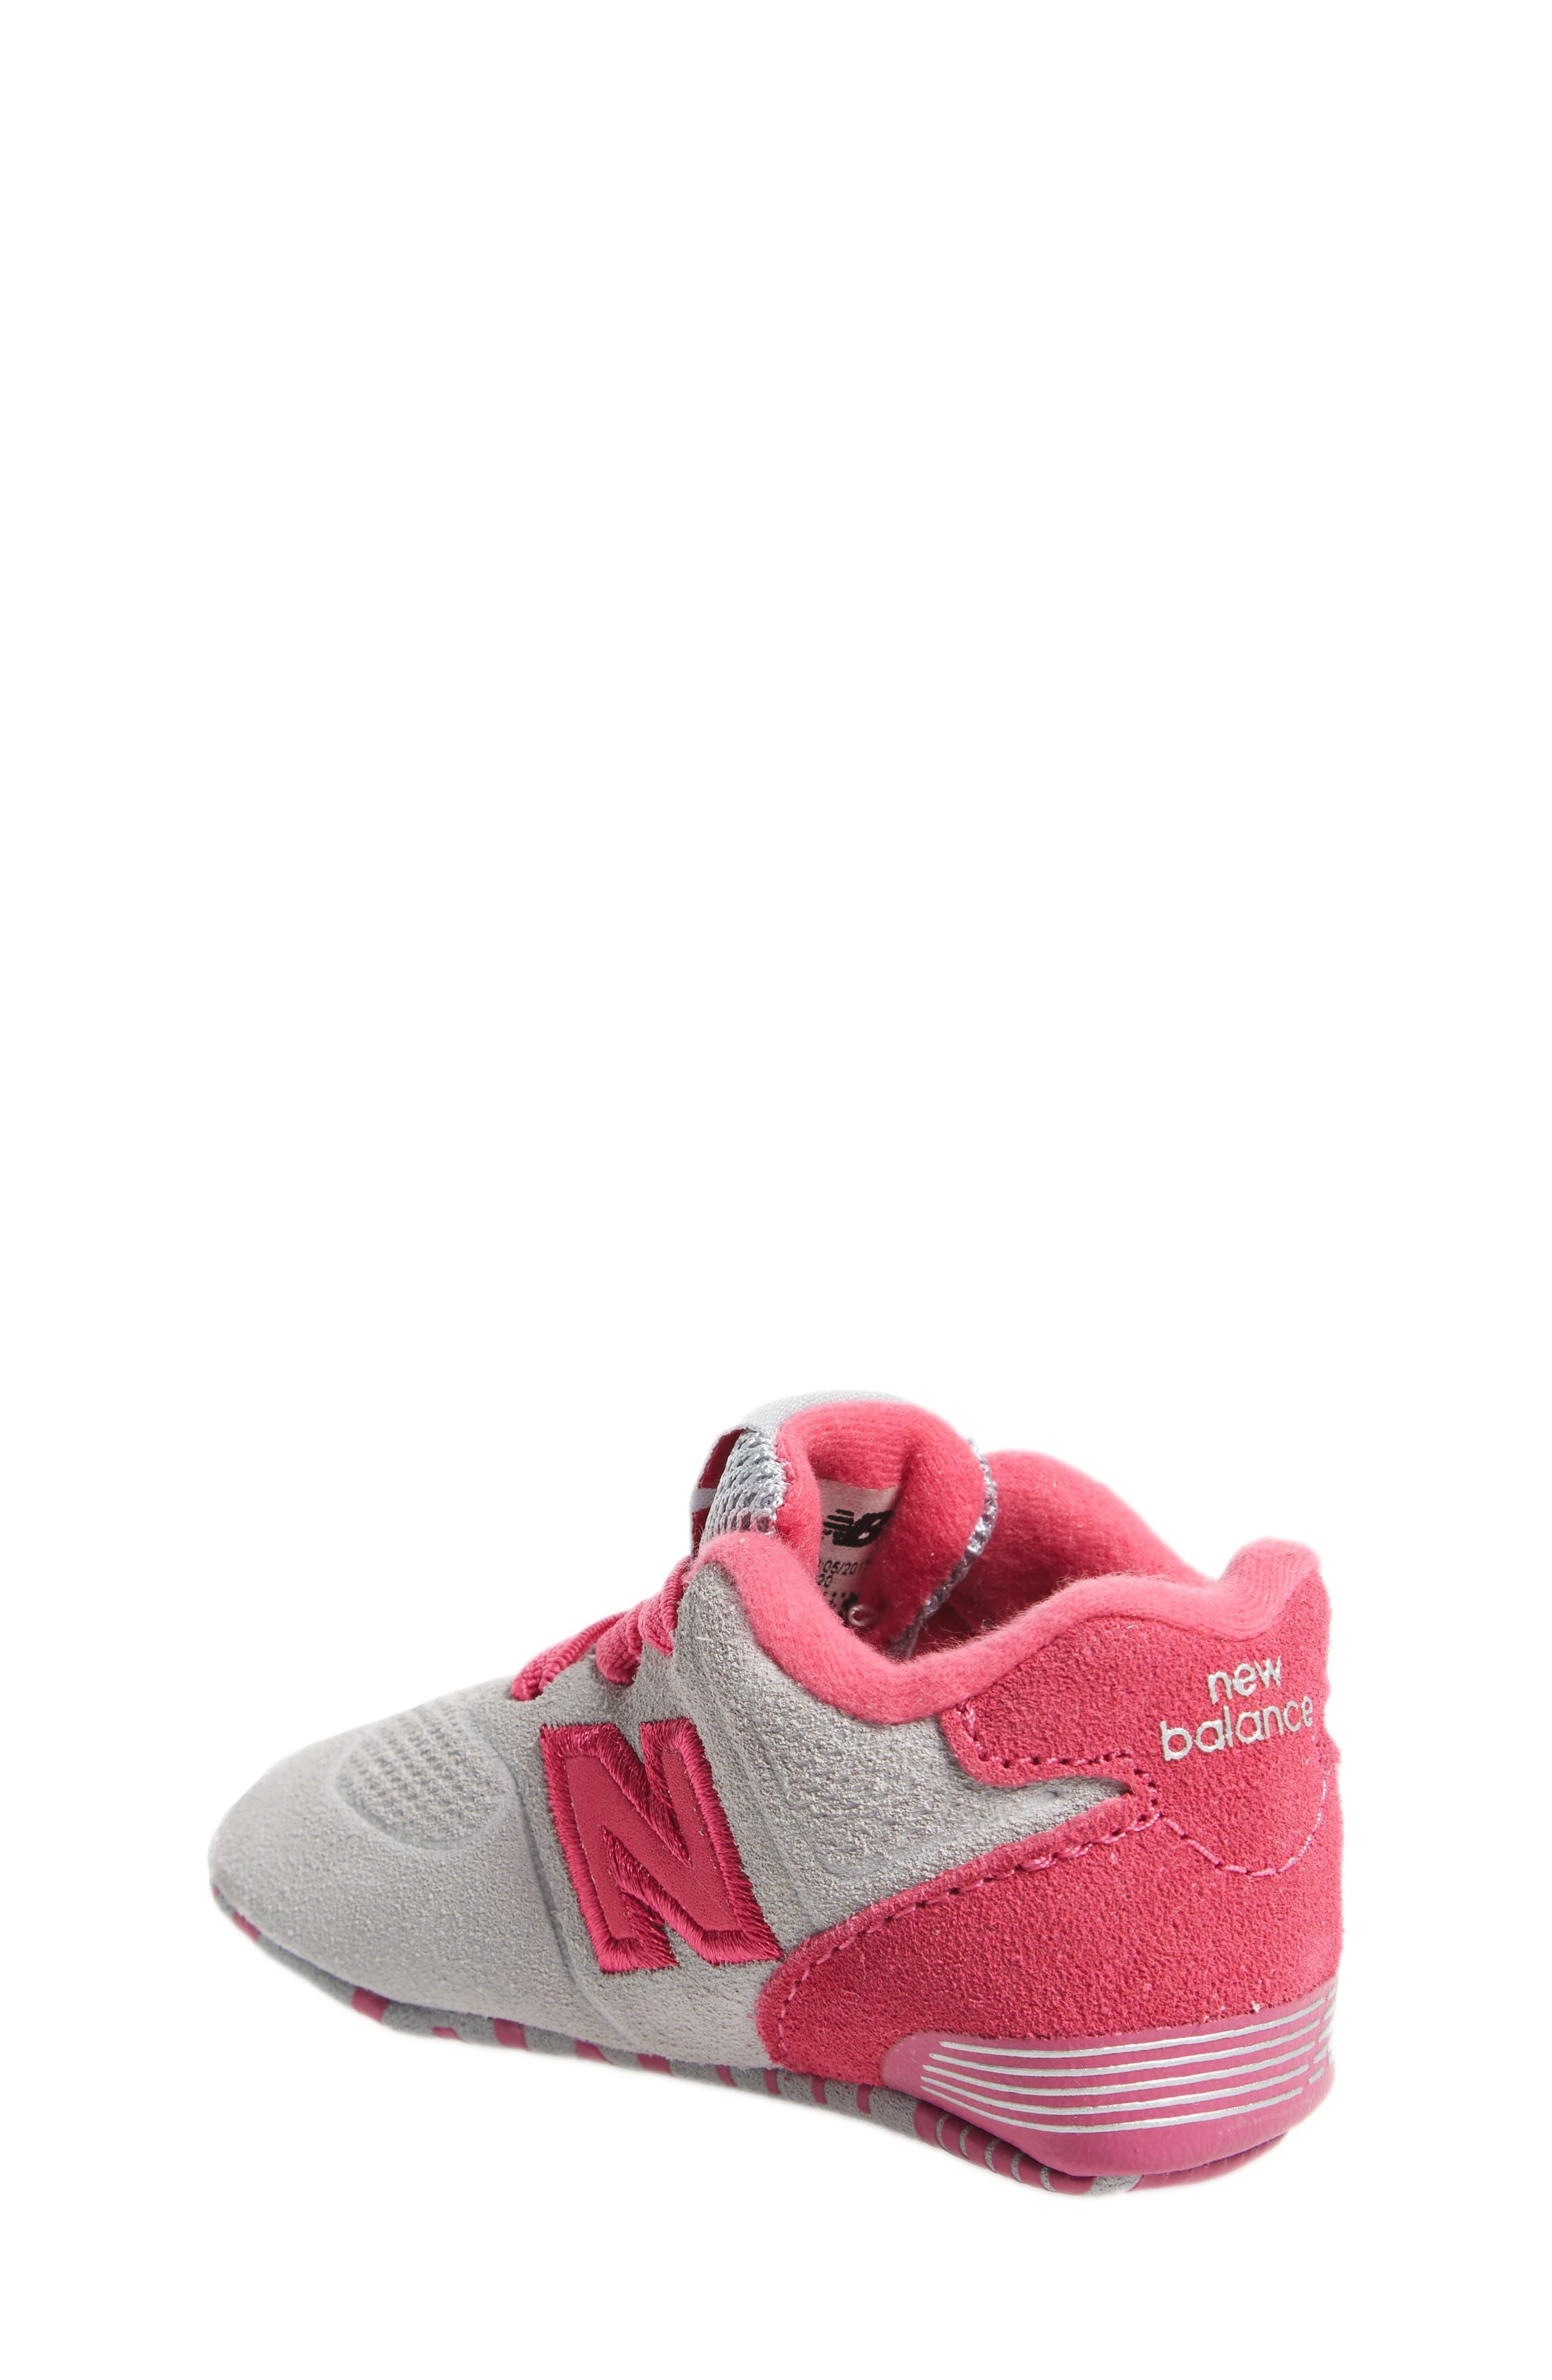 574 Crib Shoe,                             Alternate thumbnail 2, color,                             Pink/ Grey